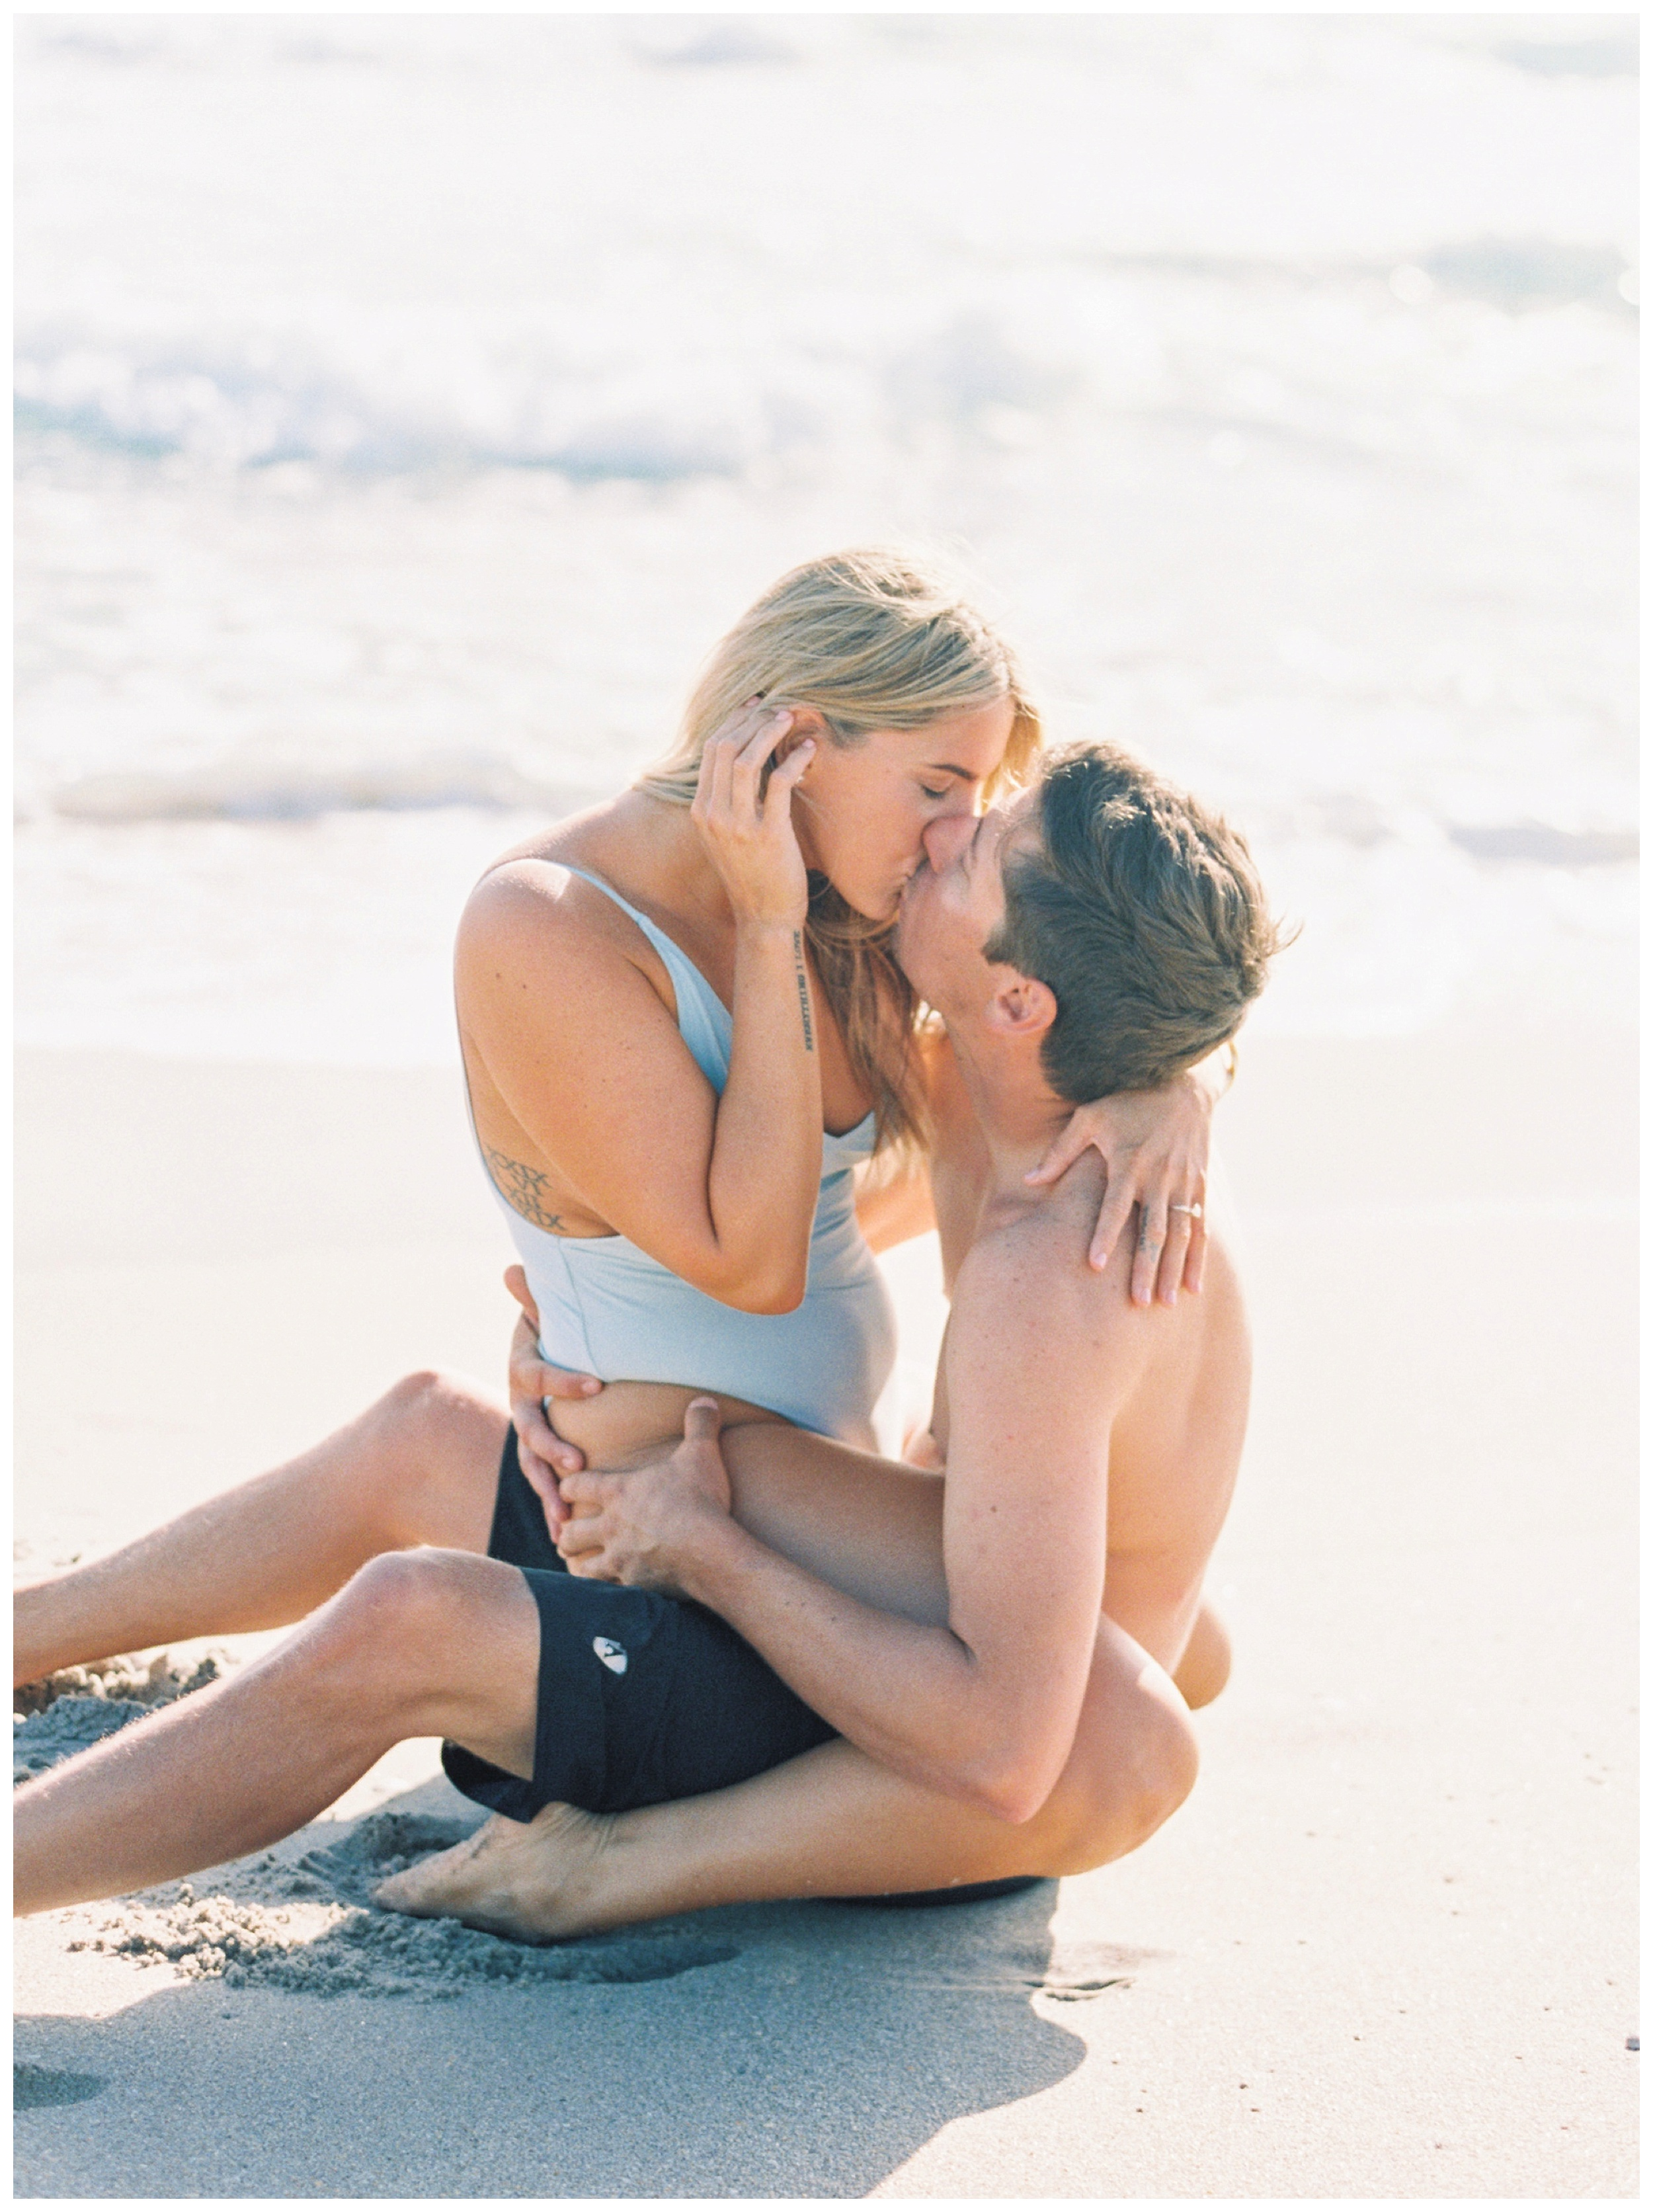 Surfboard Engagement Florida Wedding Photographer Kir Tuben_0027.jpg